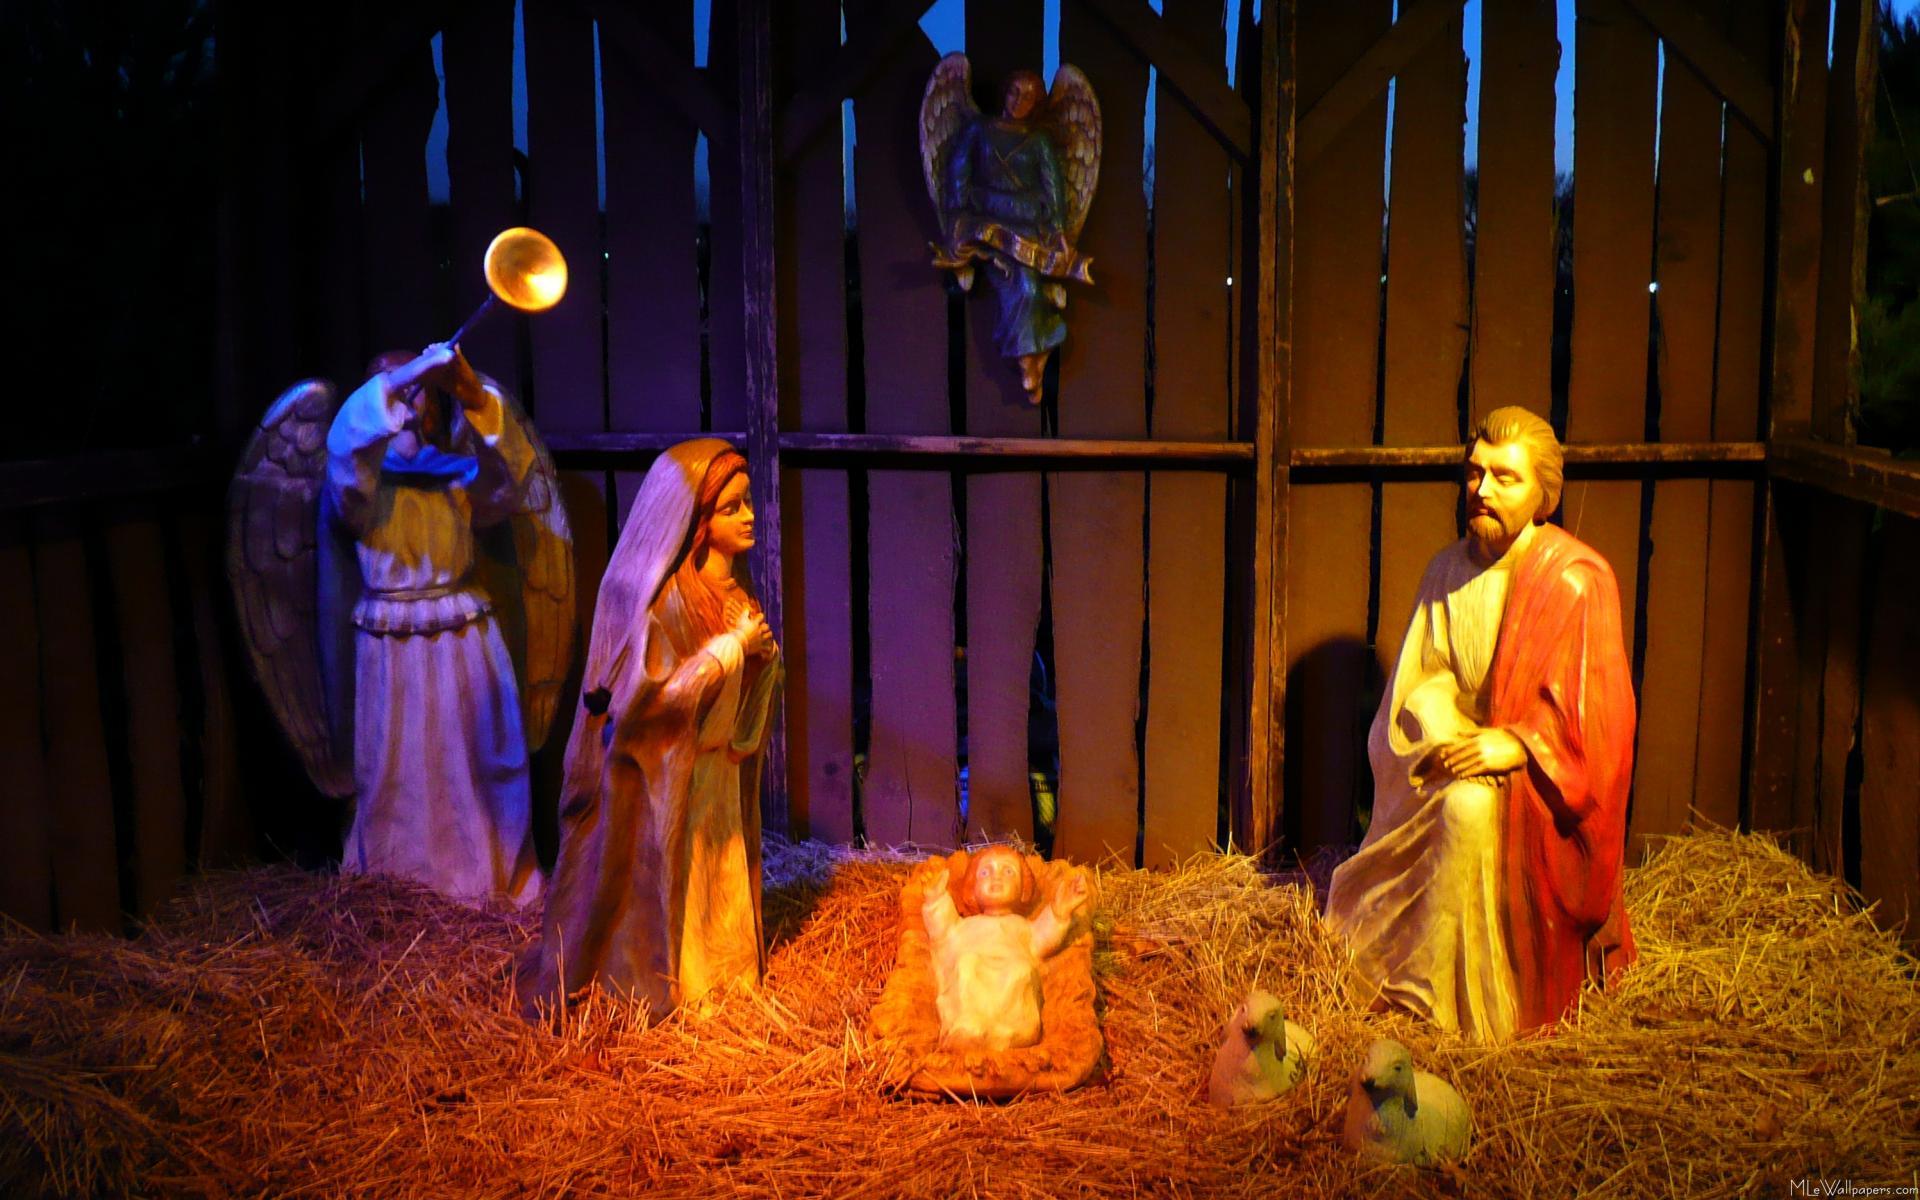 Free Nativity Scene Wallpapers - Wallpaper Cave